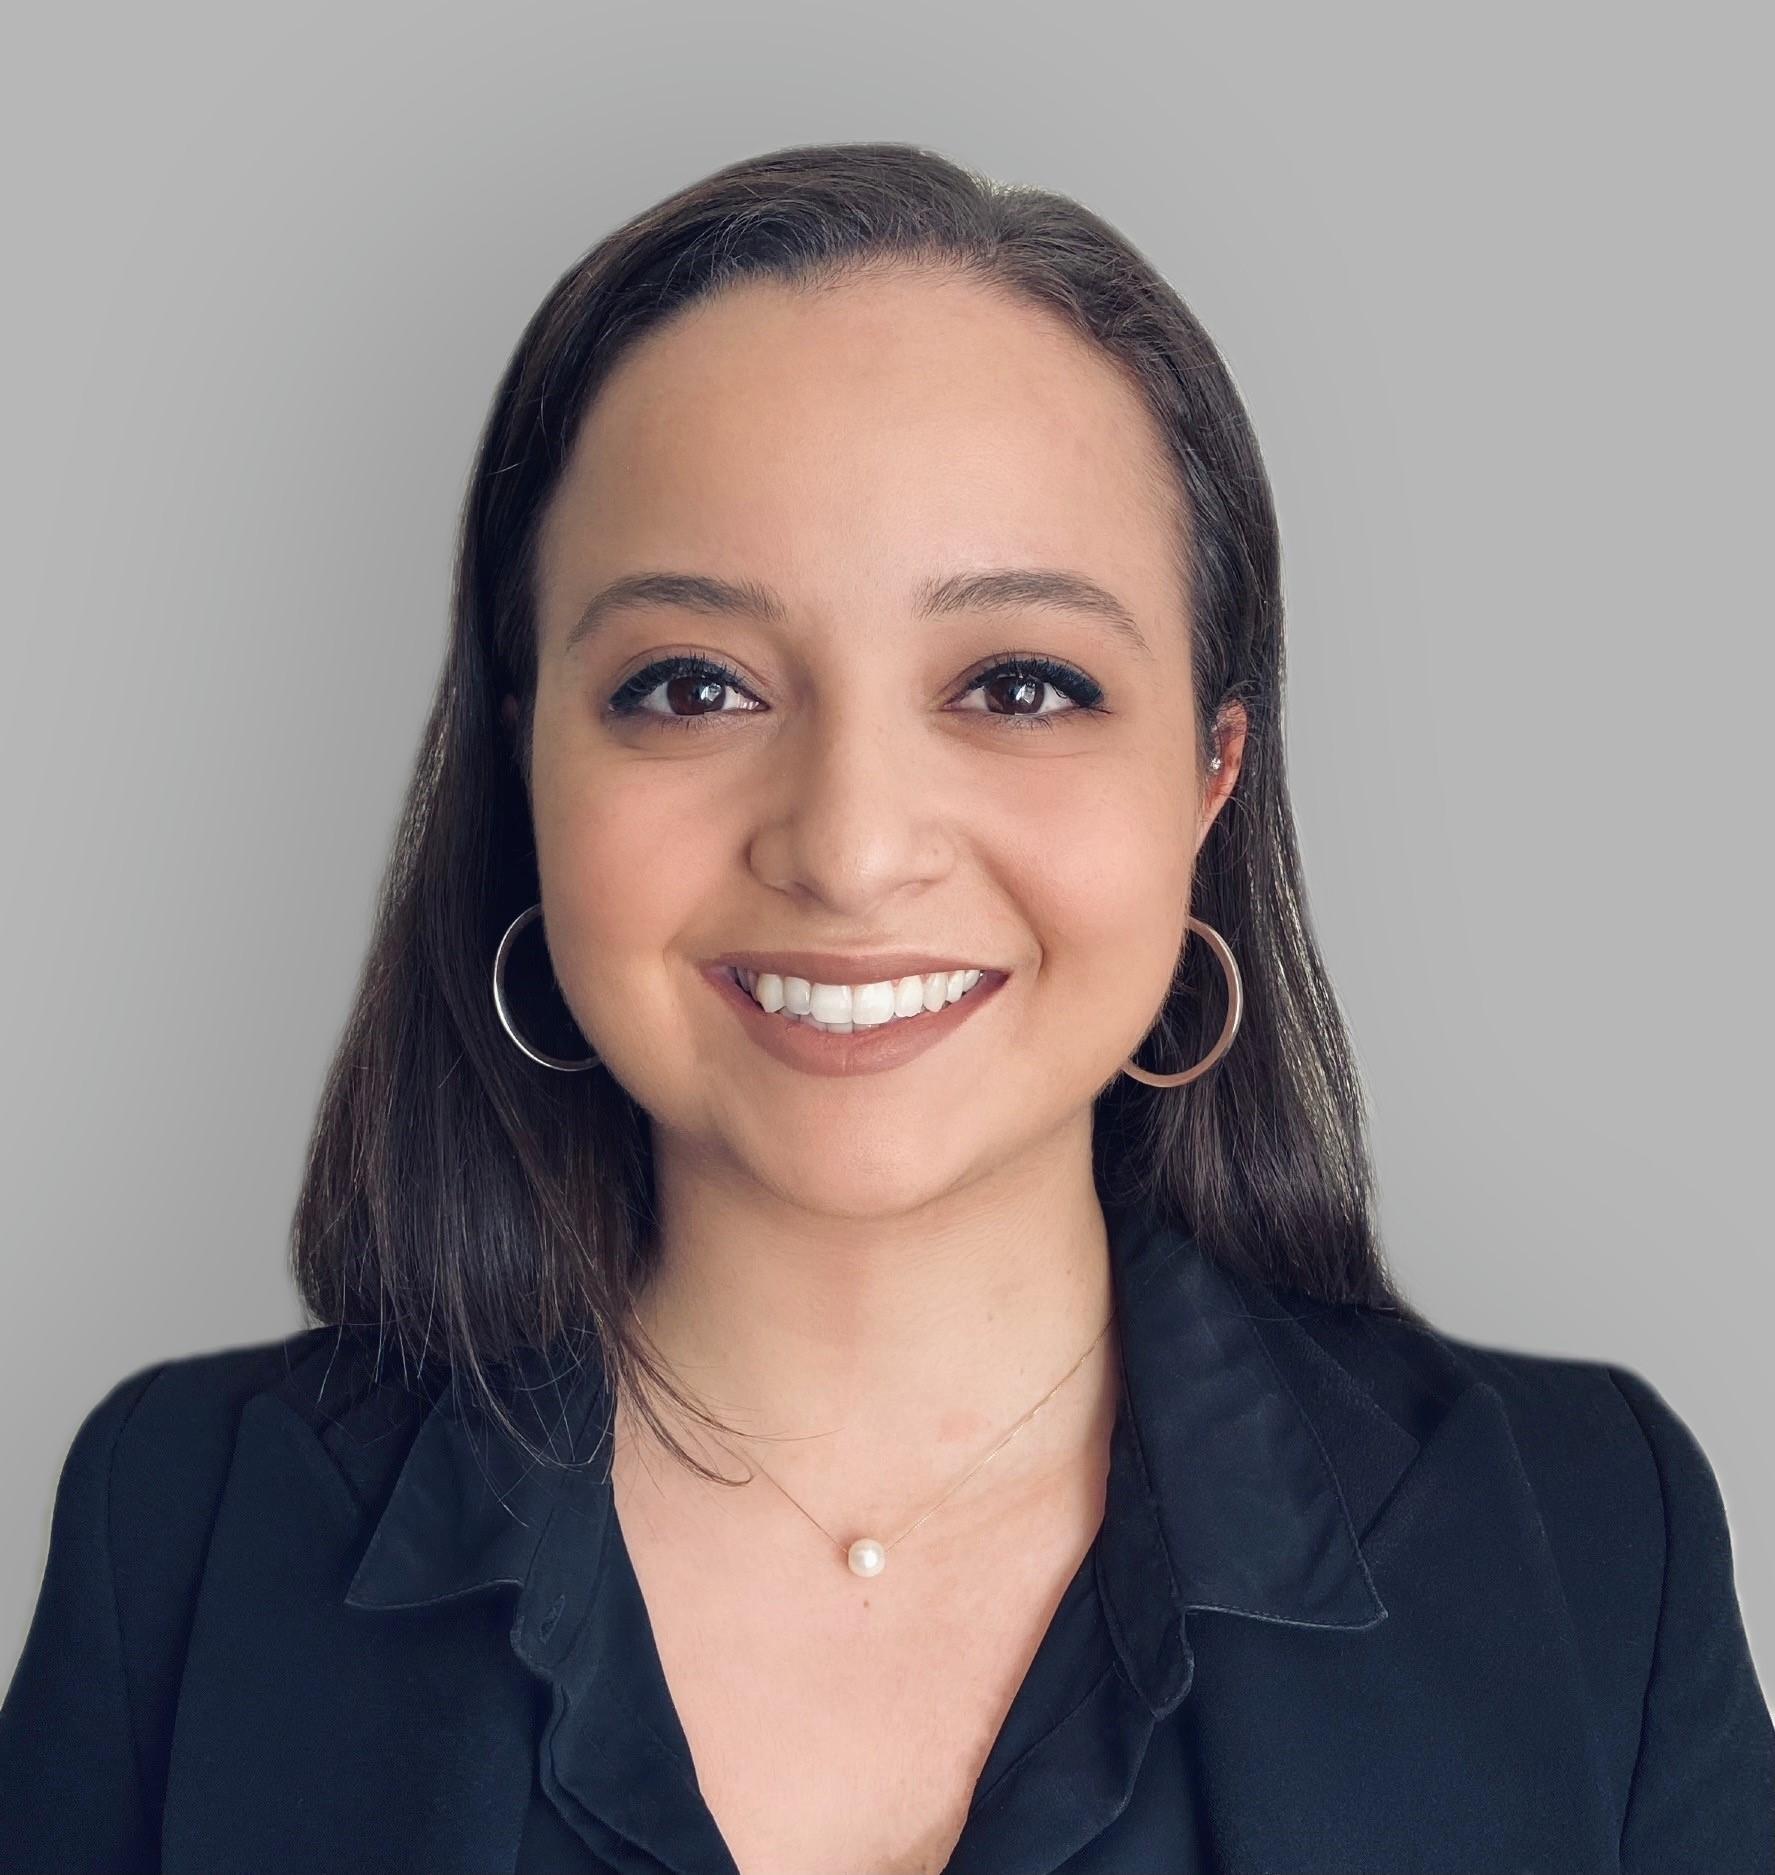 Stephanie Dagher, Villawood, NSW, ORS